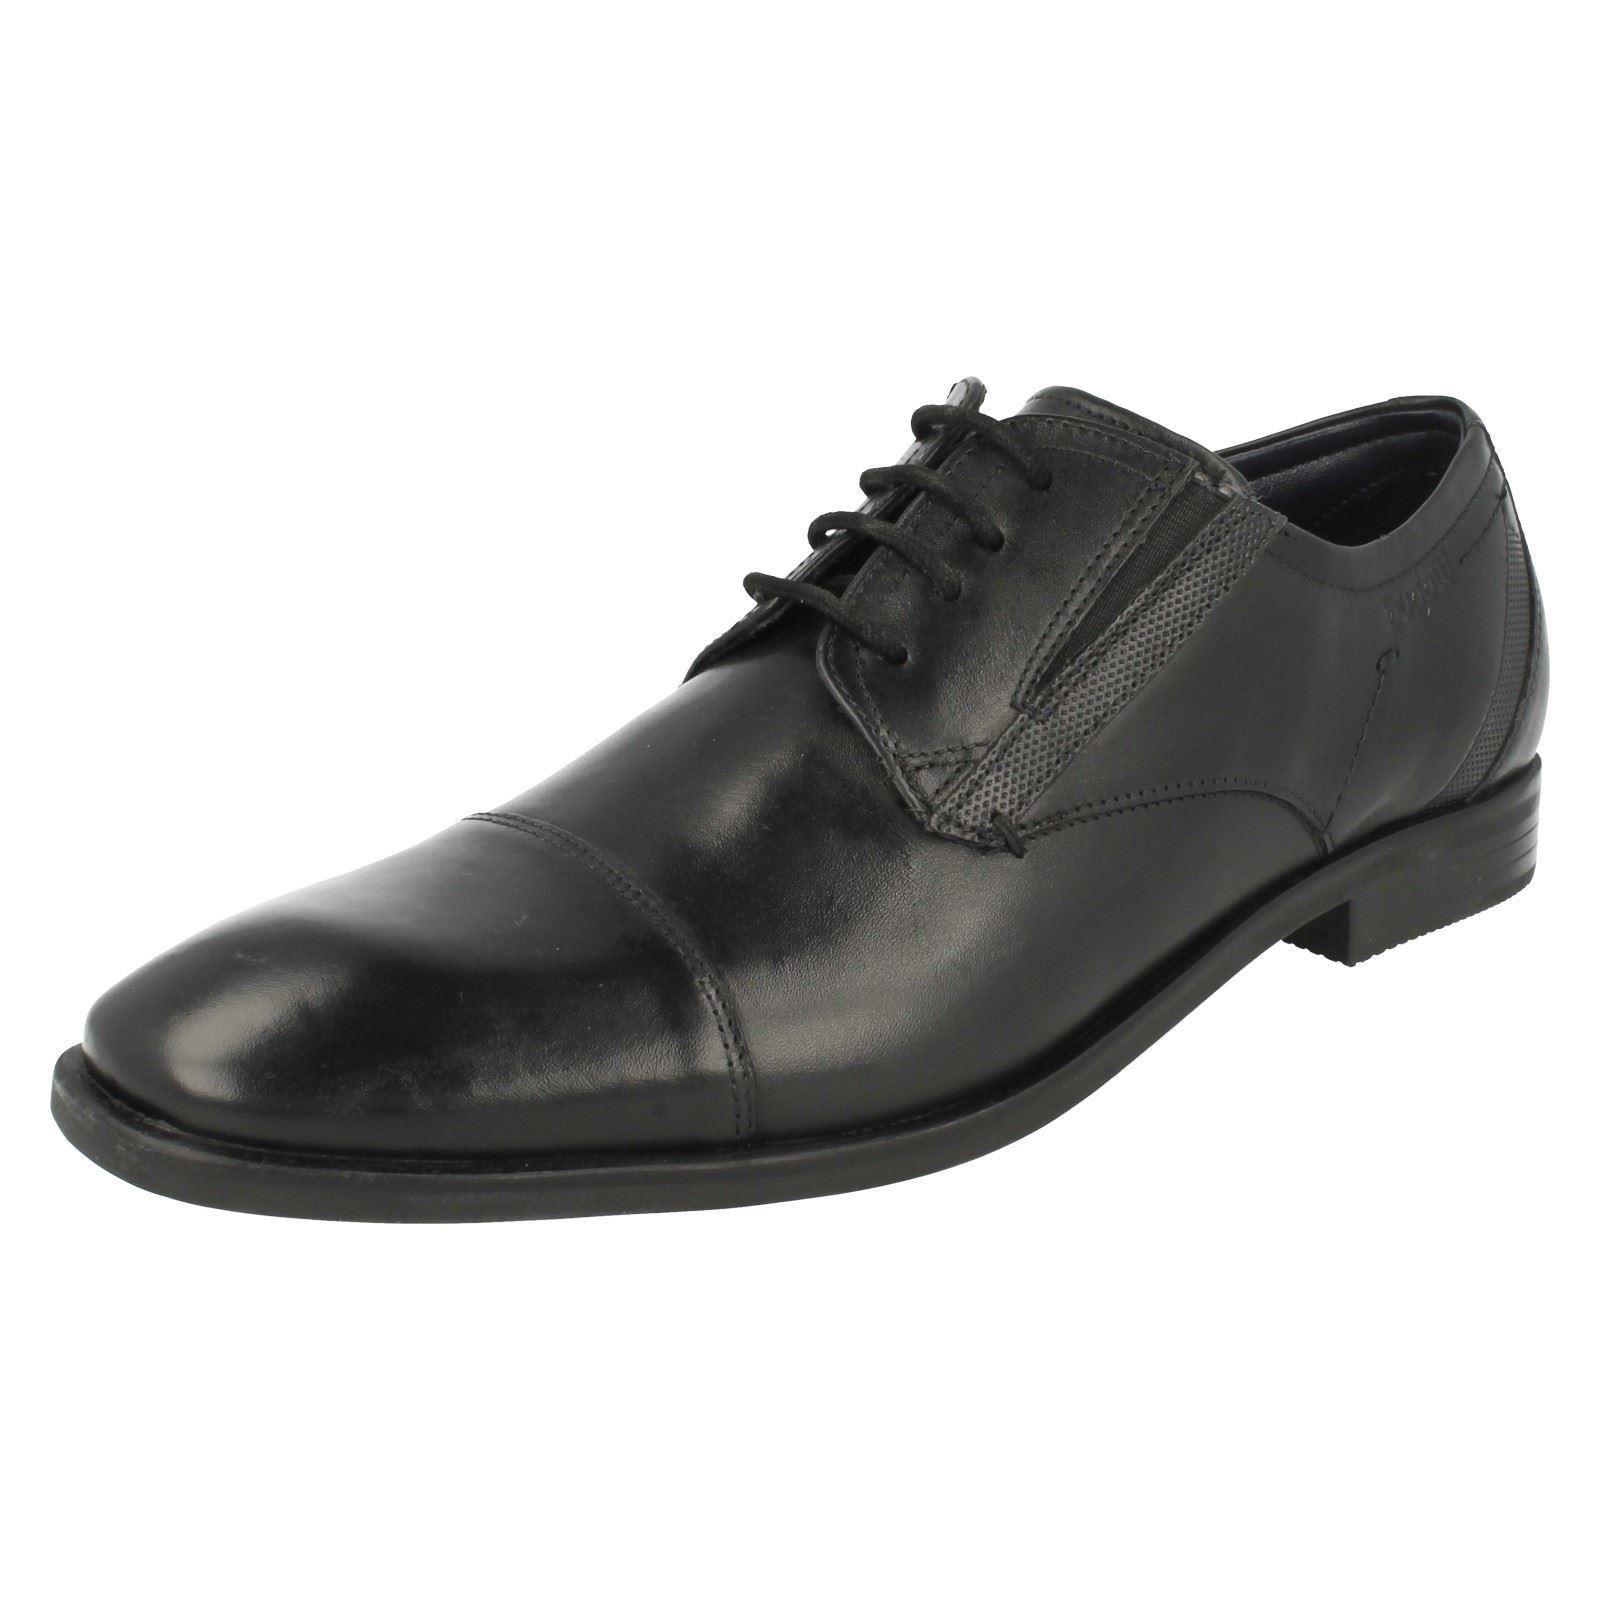 Bugatti Mens Formal Shoes - Savio Evo R3504-1